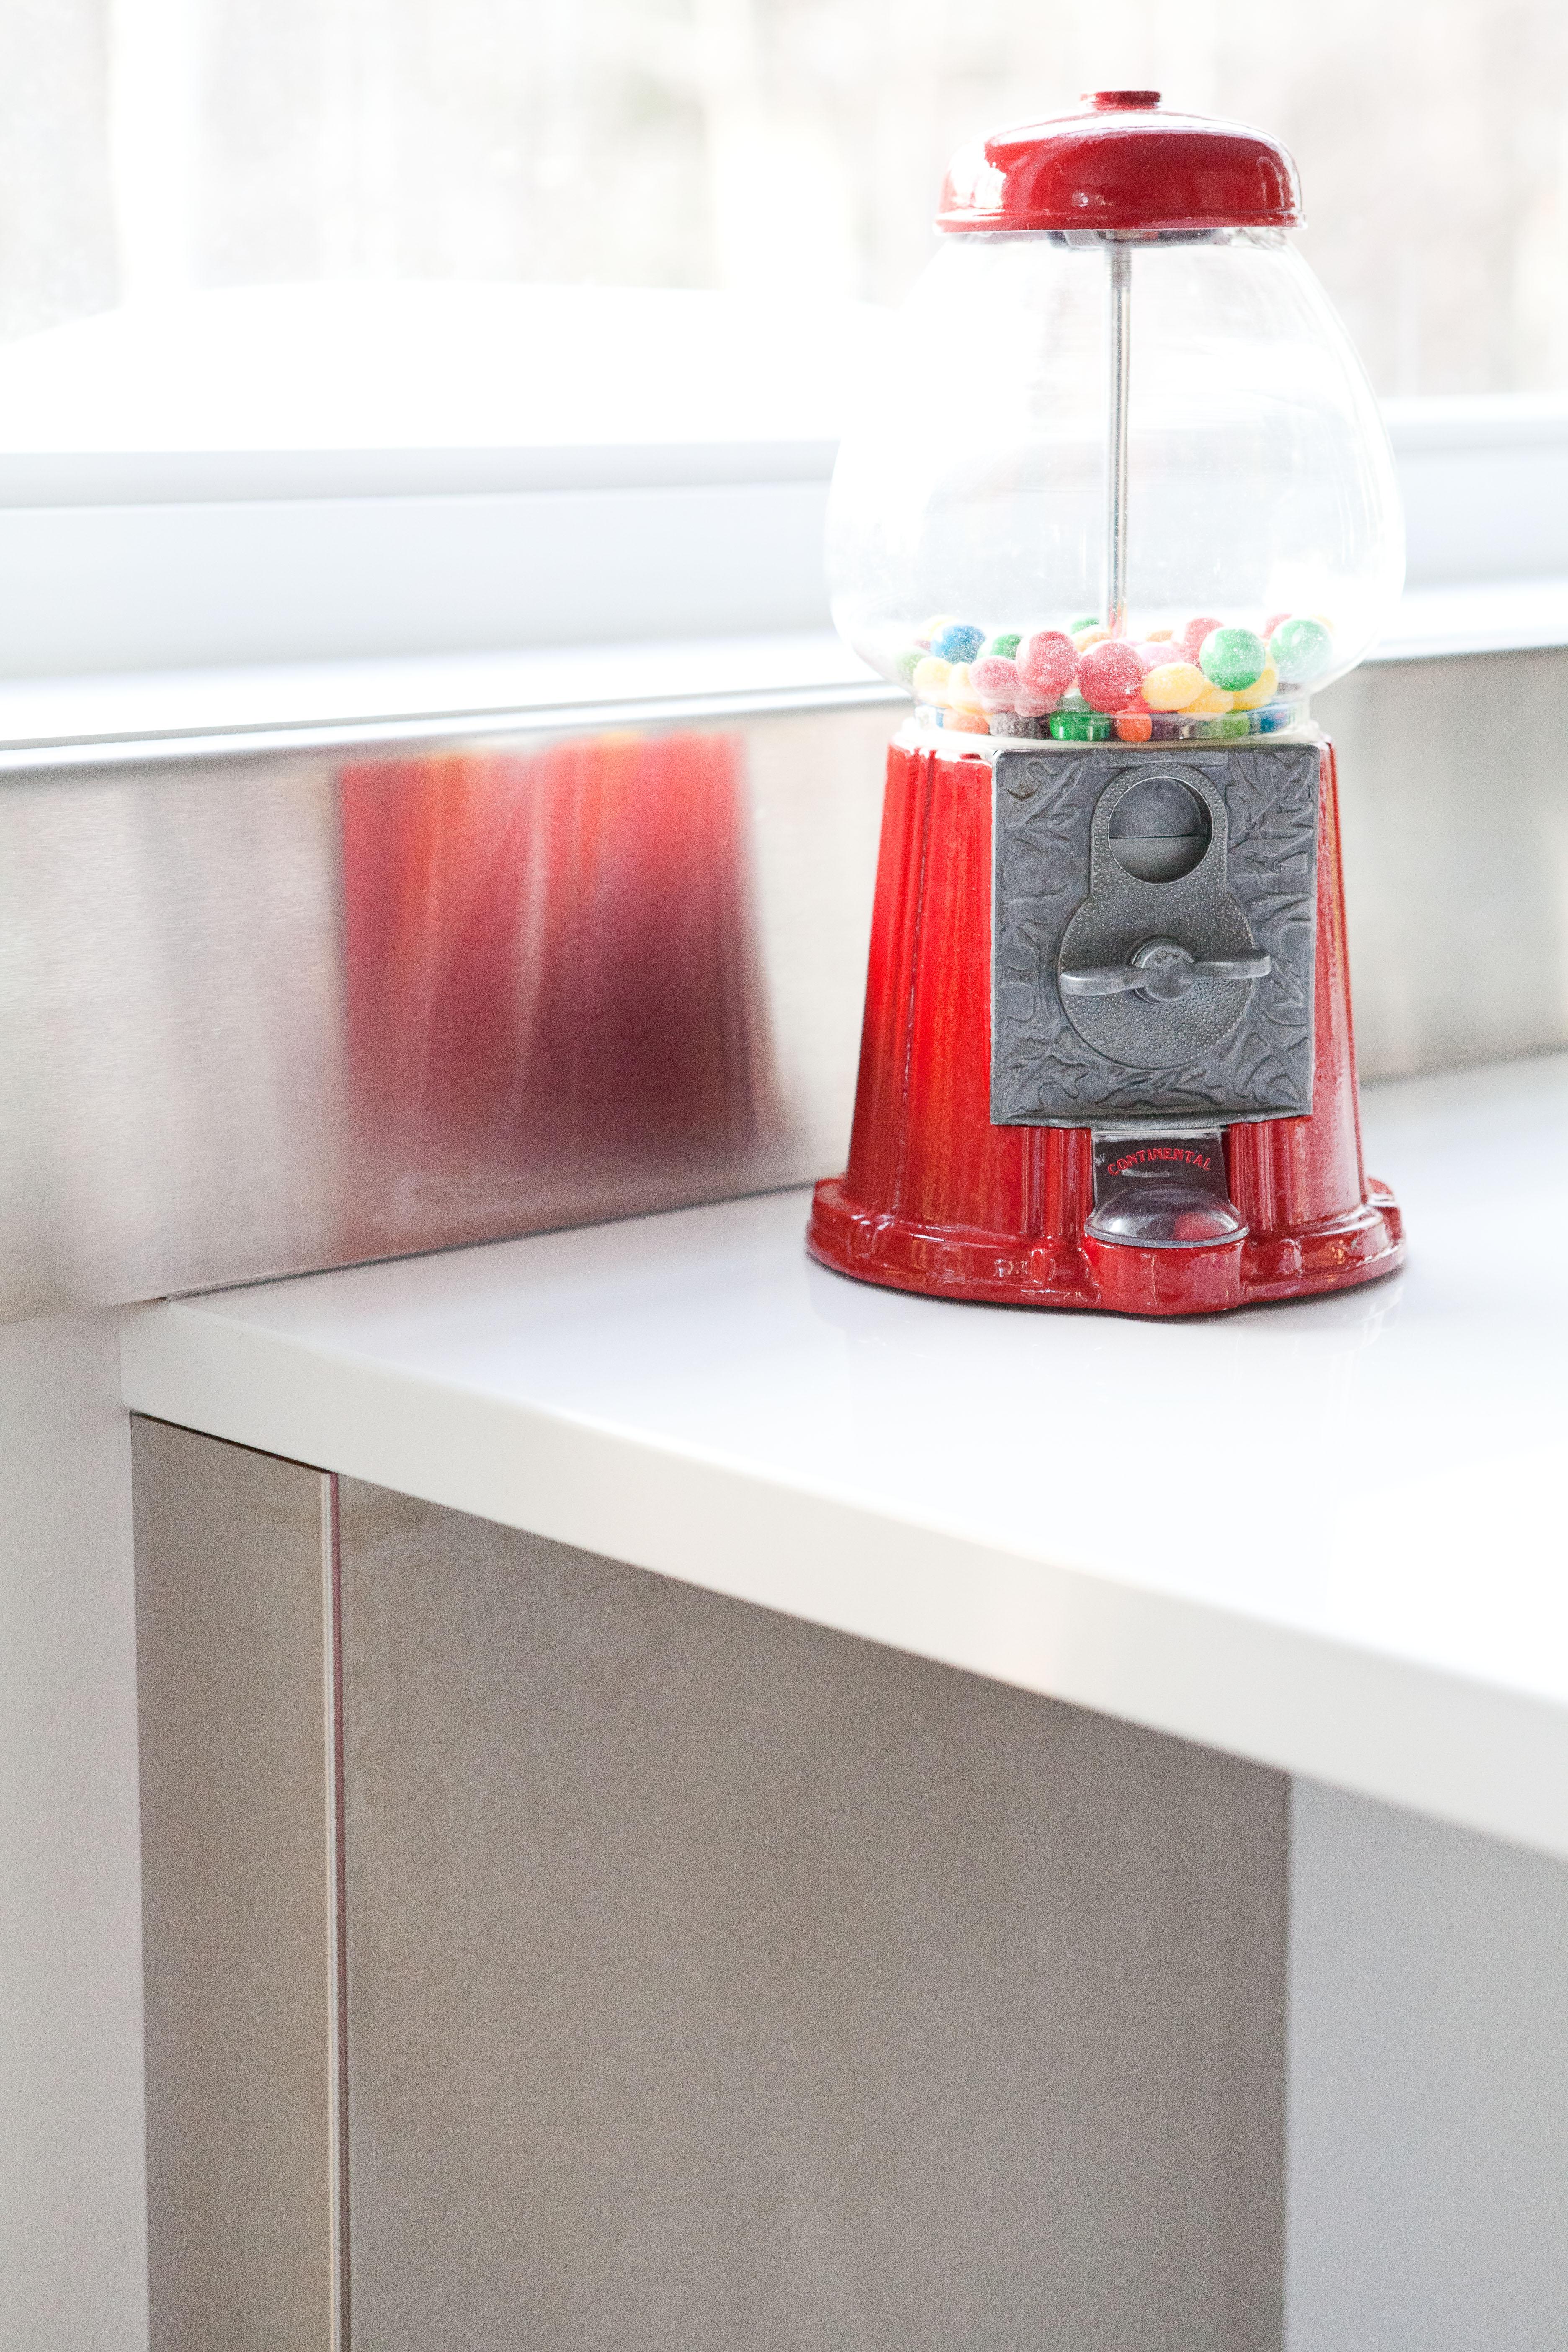 capage acier inoxydable sur mesure cuisine comptoir